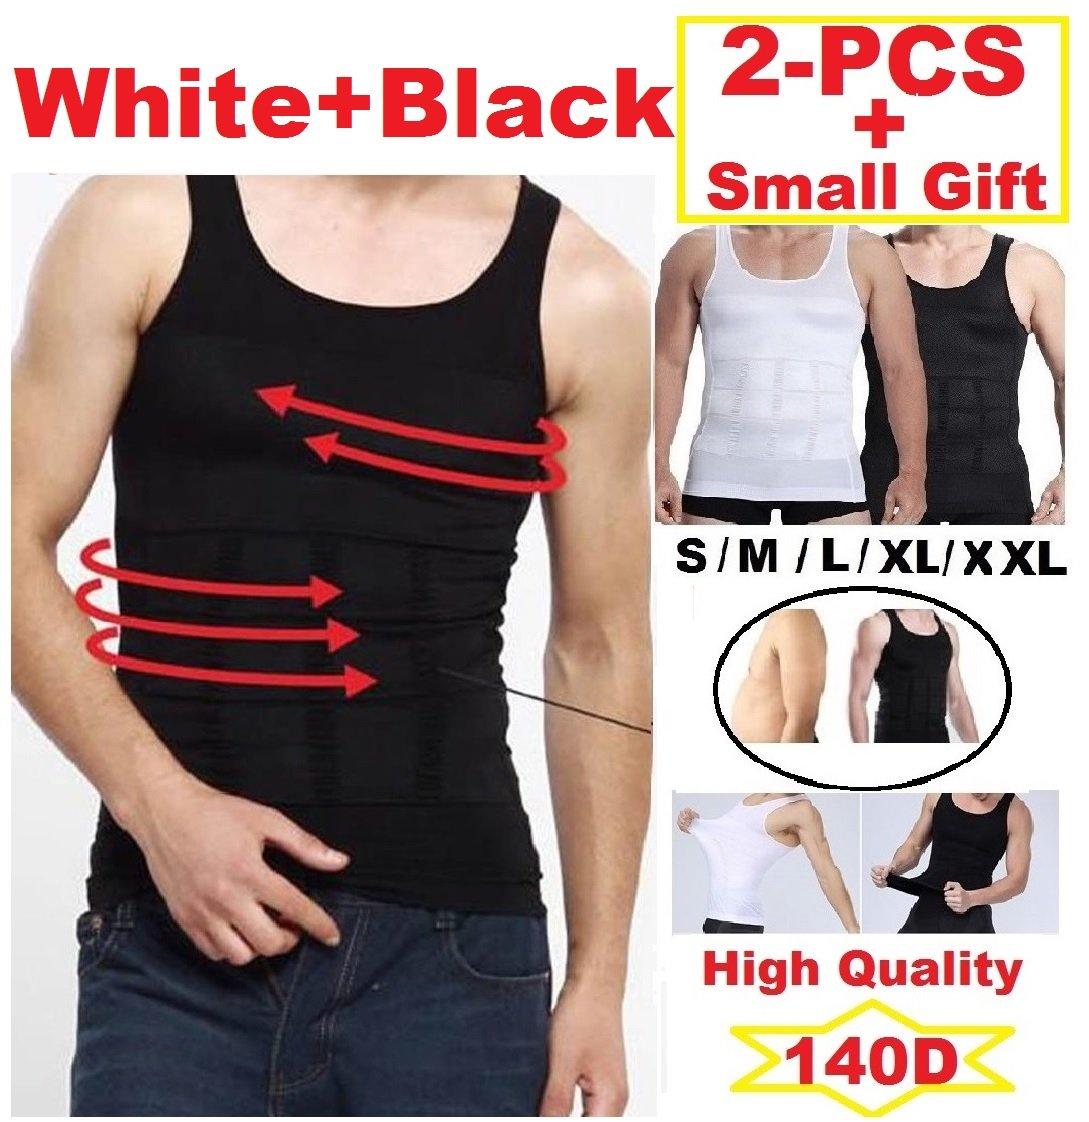 2pcs Men Slim Body Shaper Compression Undershirt Tank Vest Shapewear X-Large White & Black